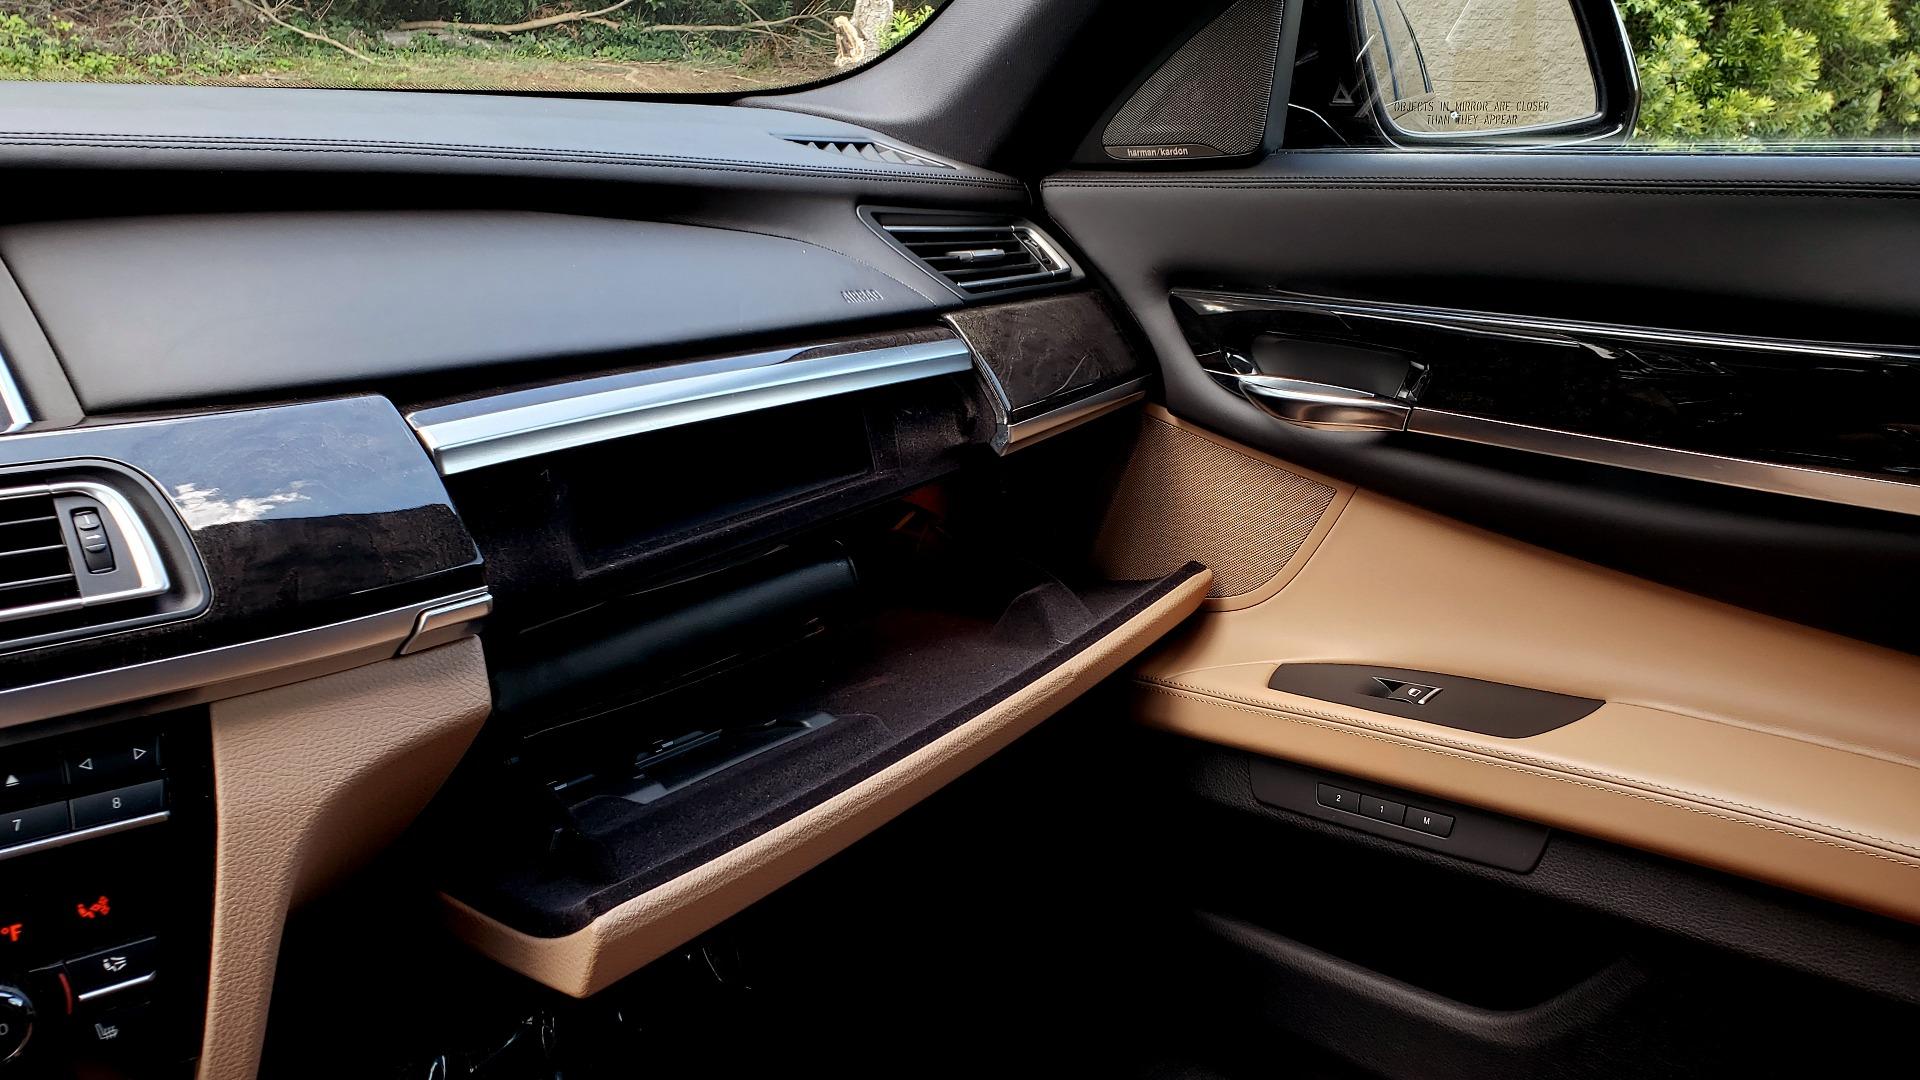 Used 2014 BMW 7 SERIES 750LI M-SPORT / EXEC PKG / DRVR ASST / LIGHTING / NAV / SUNROOF for sale Sold at Formula Imports in Charlotte NC 28227 48